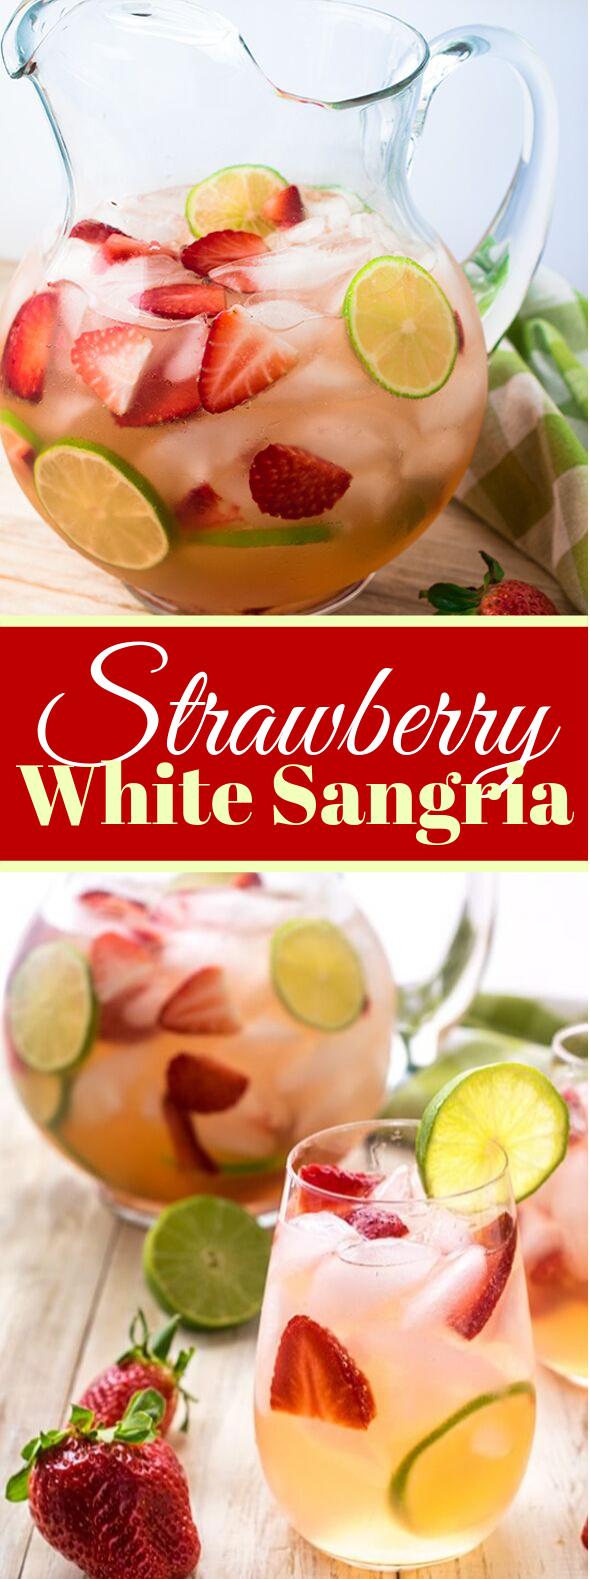 REFRESHING STRAWBERRY SANGRIA RECIPE #drinks #freshfruit